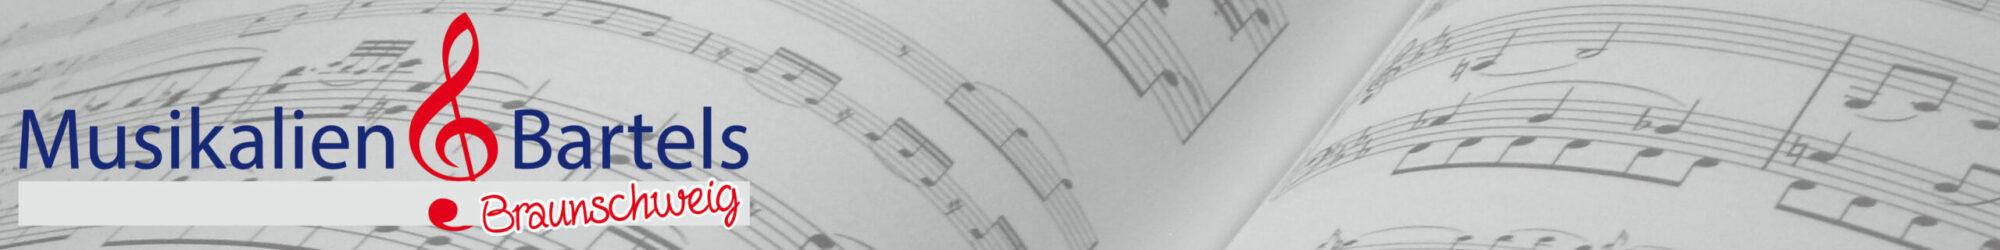 Musikalien Bartels